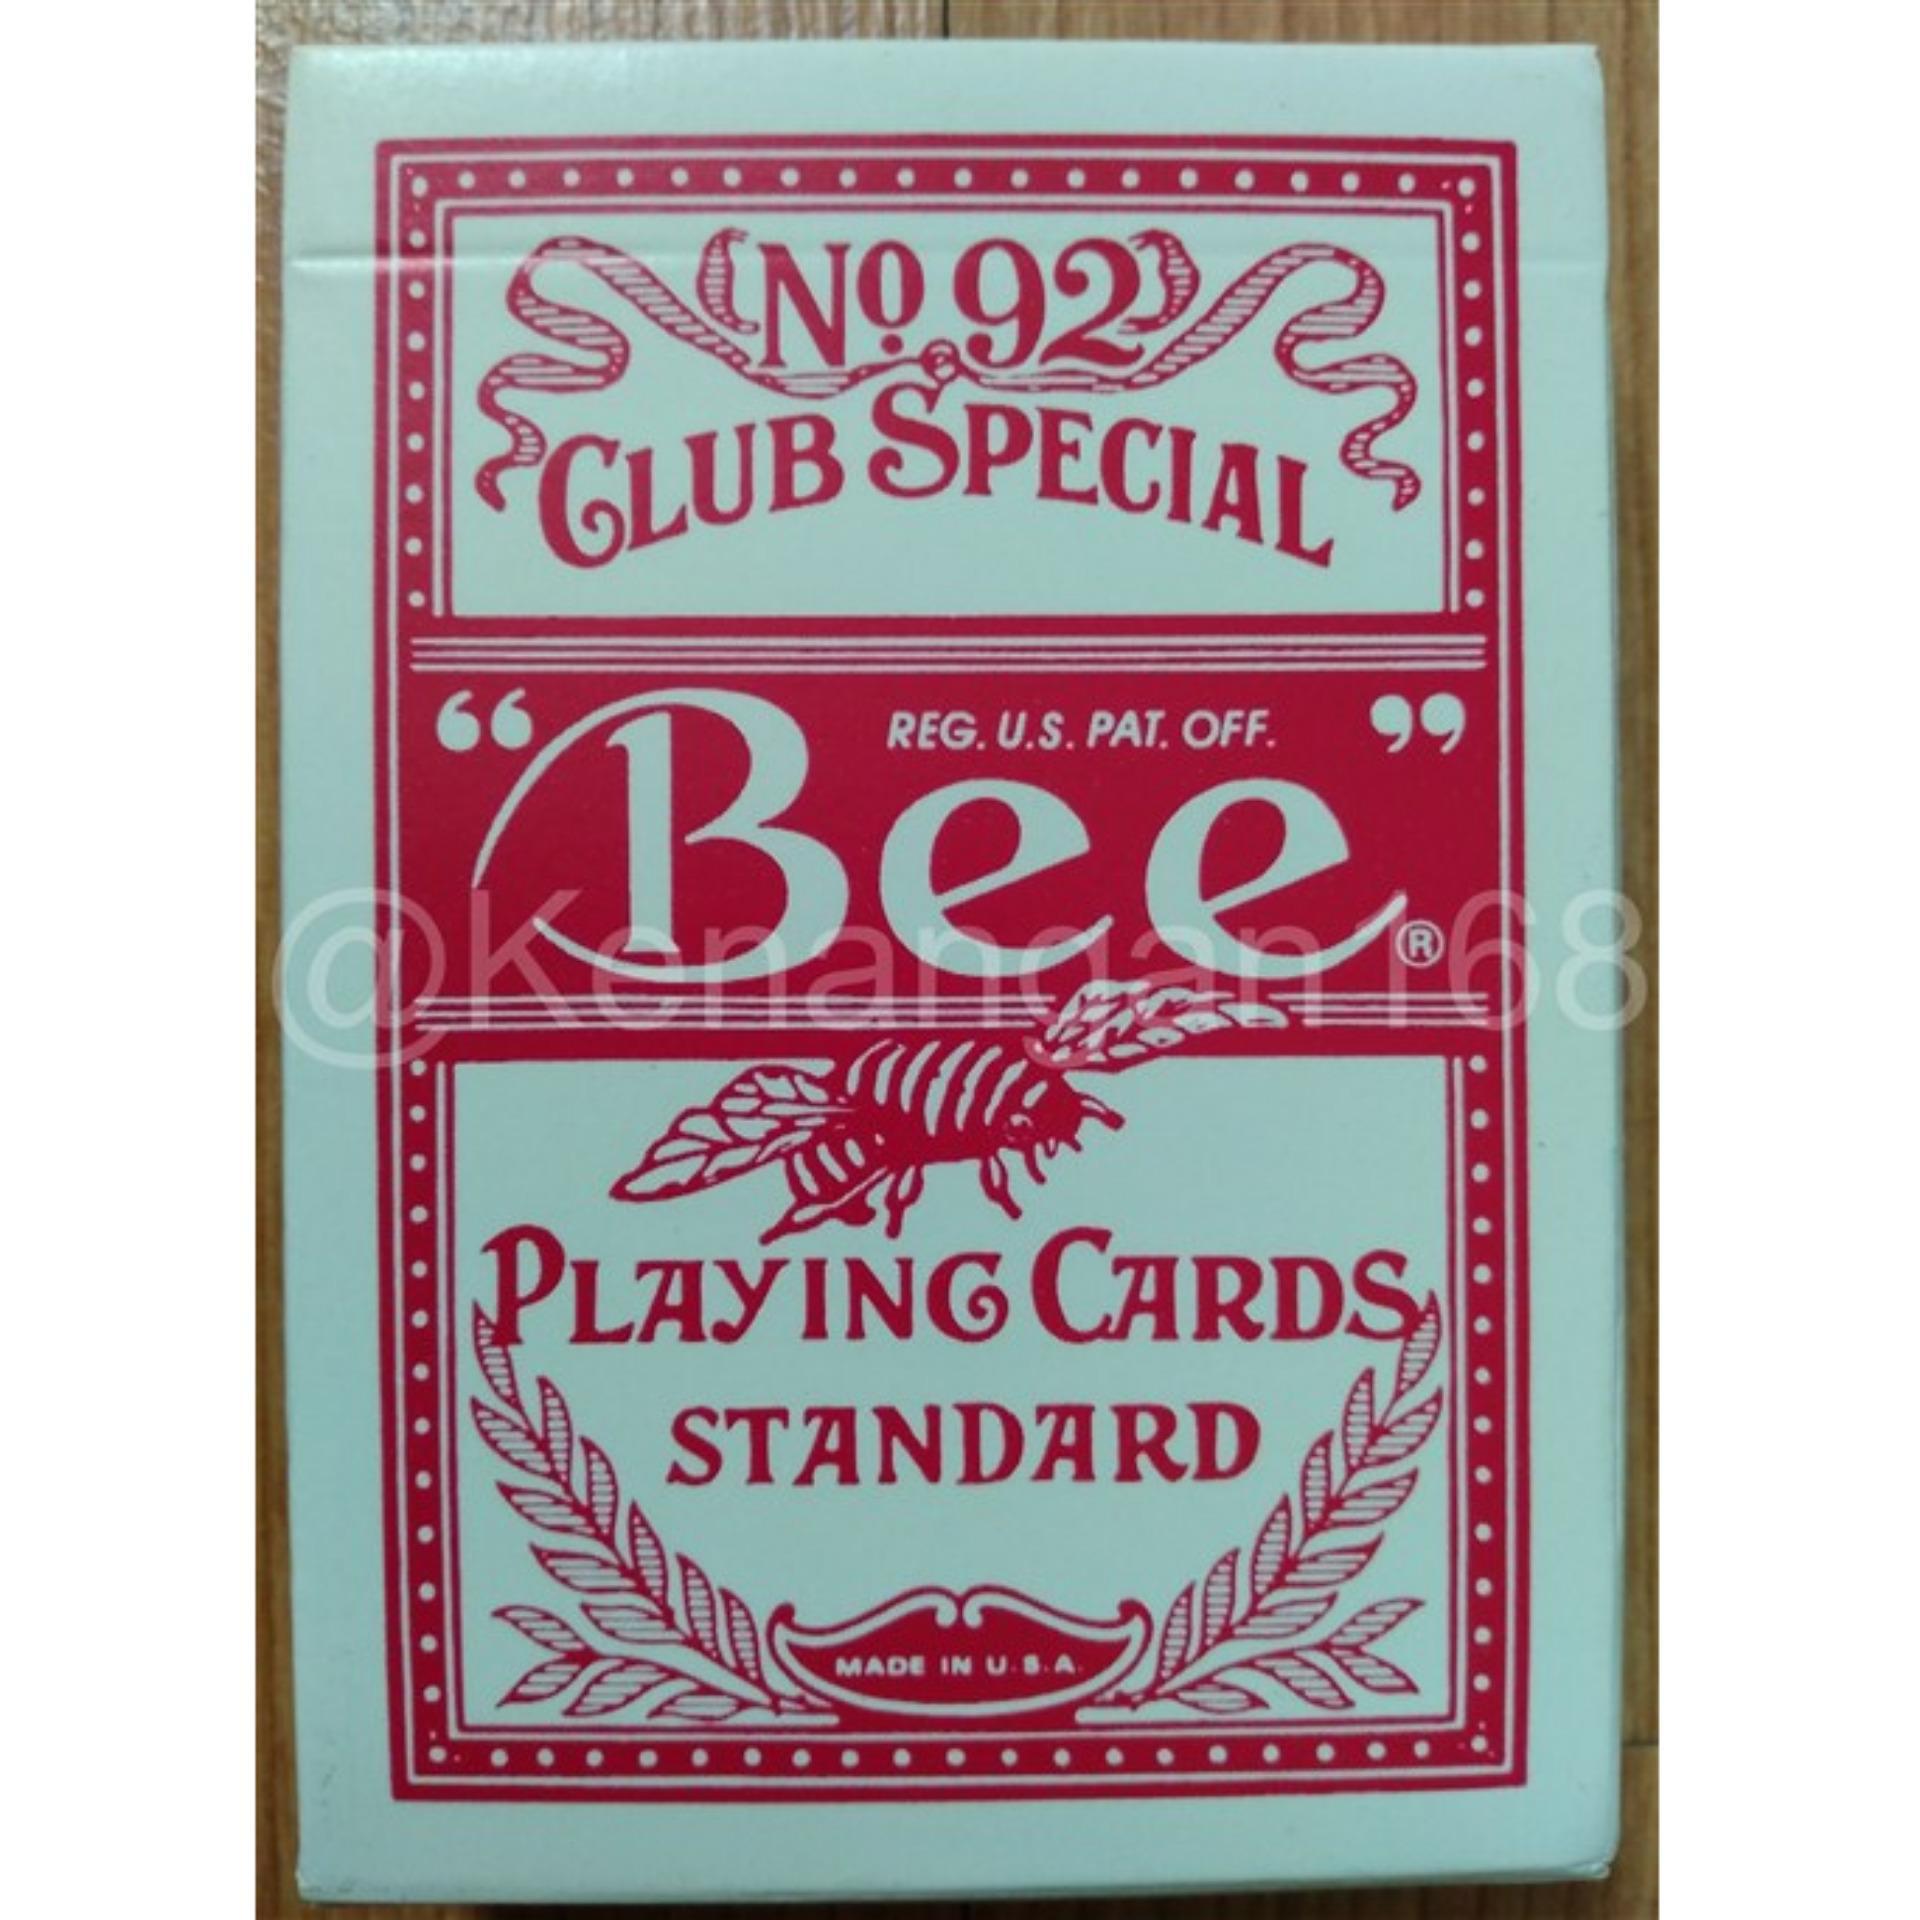 ... Kartu remi BEE Stinger No. 92 import USA warna Merah ...